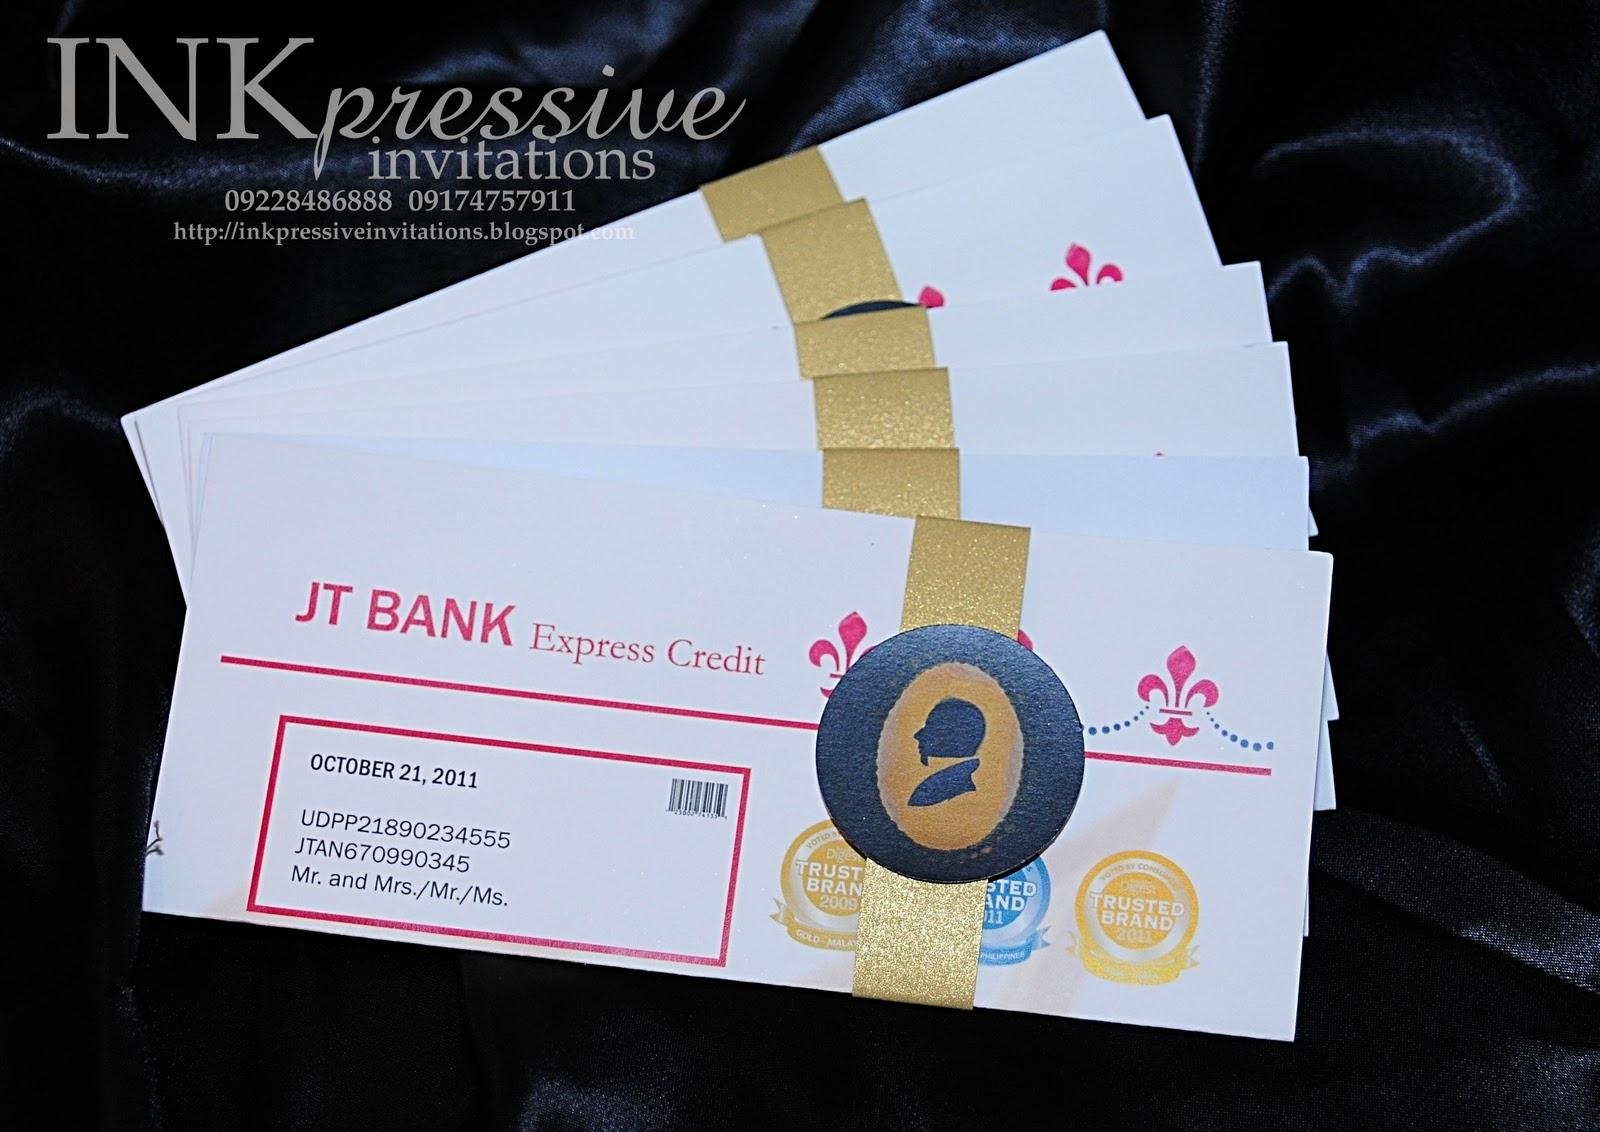 Credit card invitation inkpressive invitations credit card invitation stopboris Gallery